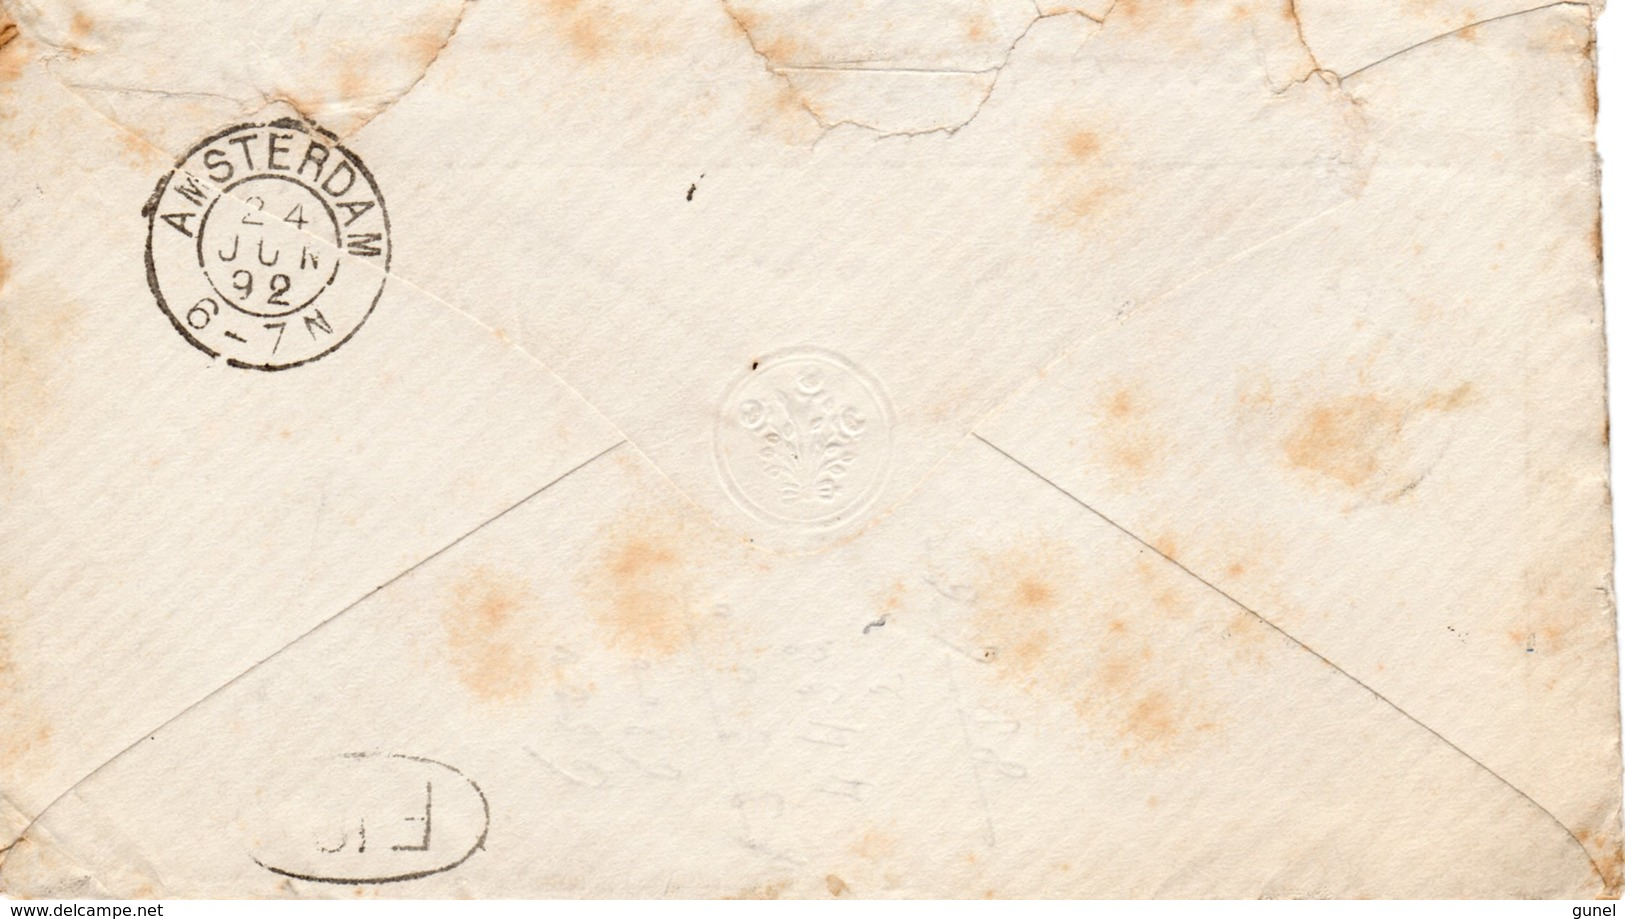 24 JUN 92 Envelopje Met Firmalogo Lokaal Te Amsterdam Met NVPH34 Met Puntstempel 5 - Periode 1891-1948 (Wilhelmina)